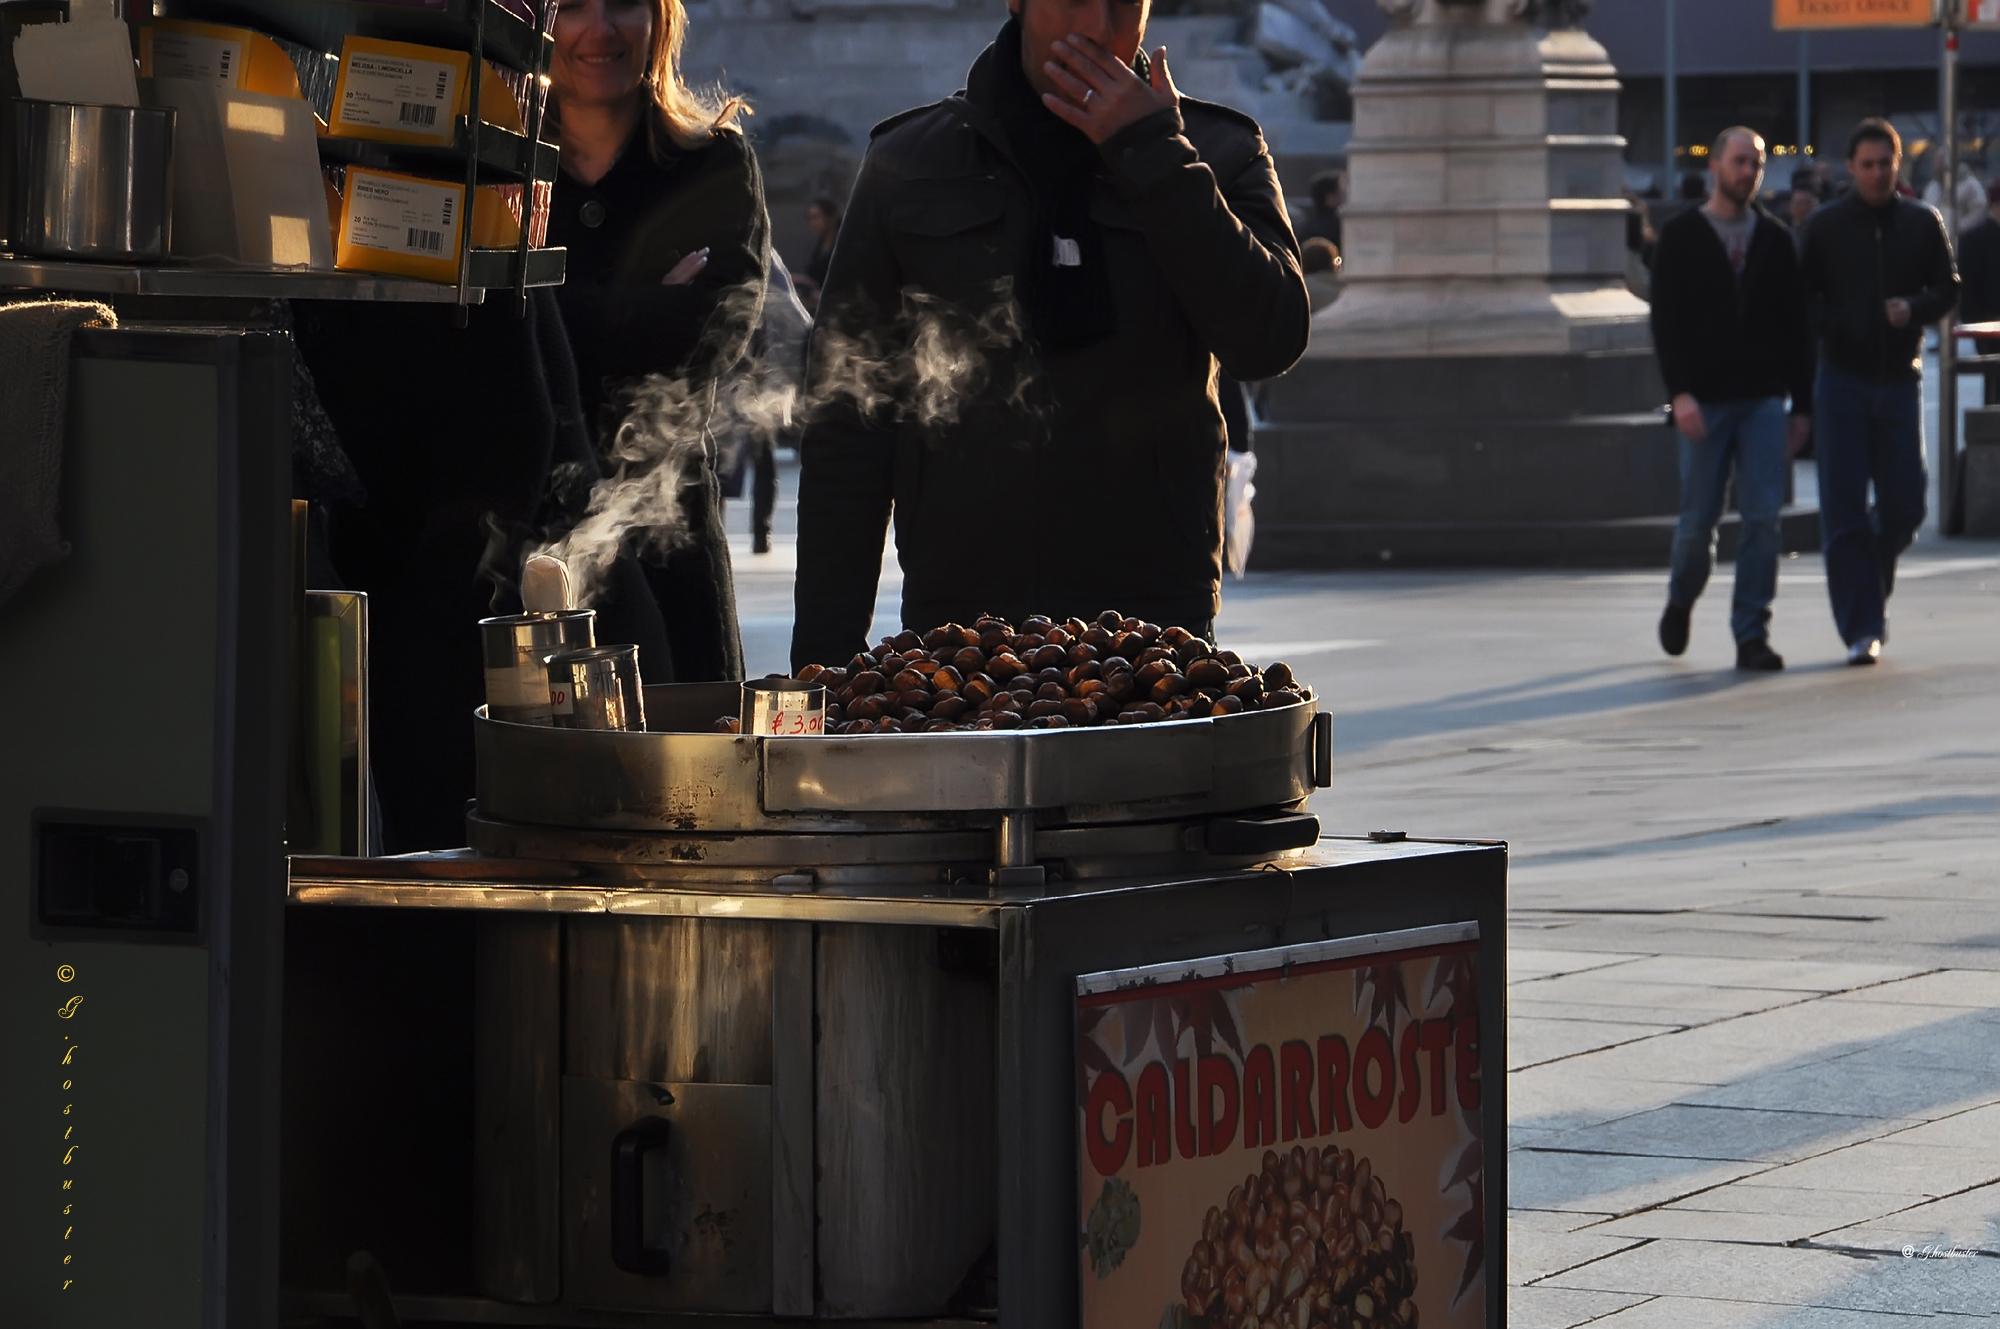 Le caldarroste, oggi un lusso milanese (photo: Luigi Alloni)